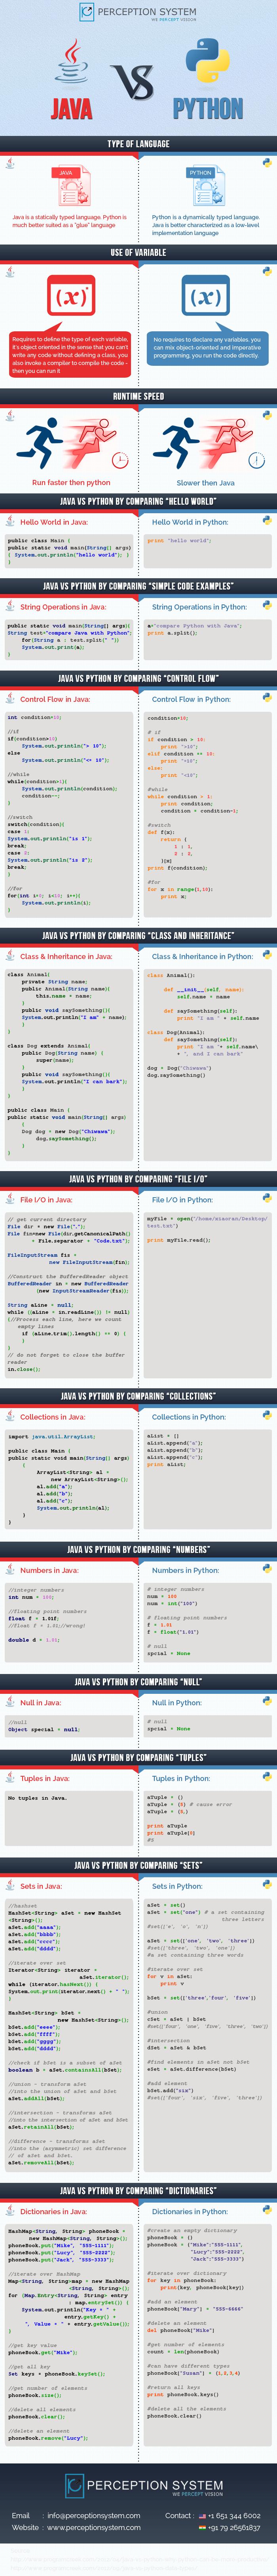 JavaVsPython-infographic.png